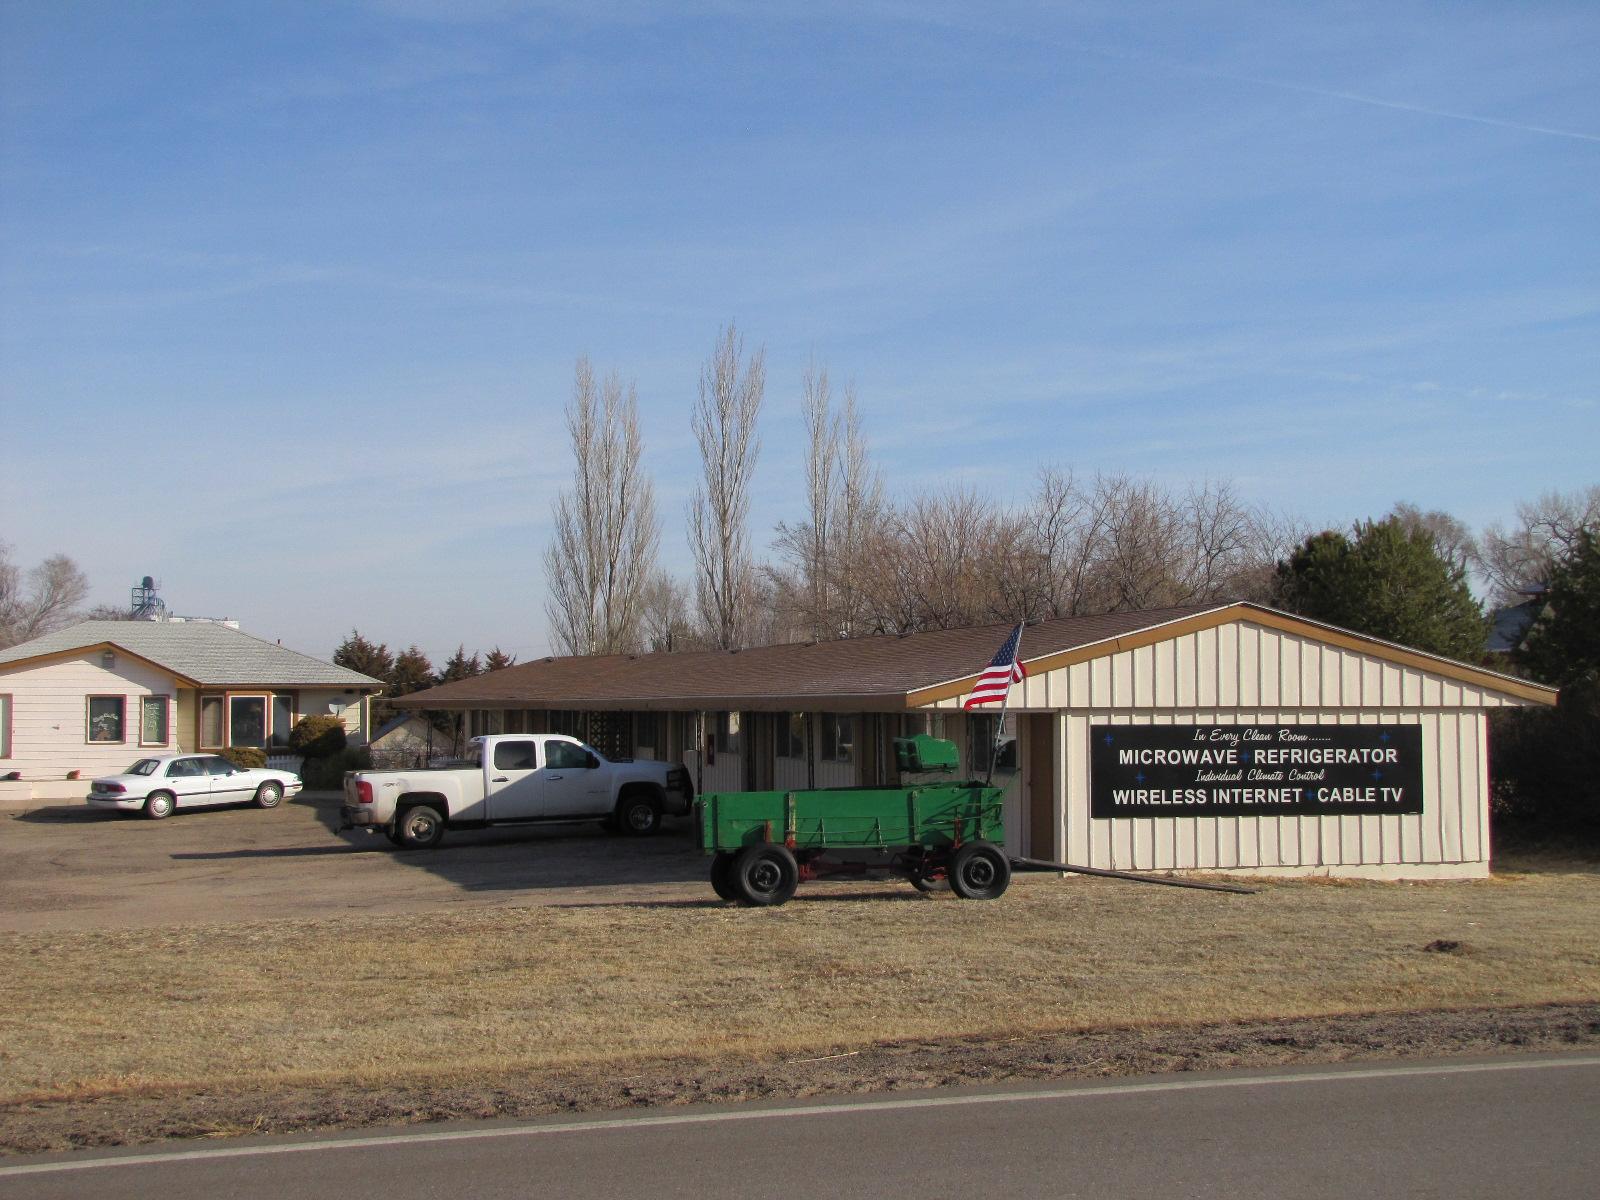 Homesteader Motel-Rv Trailer, Saint Francis KS